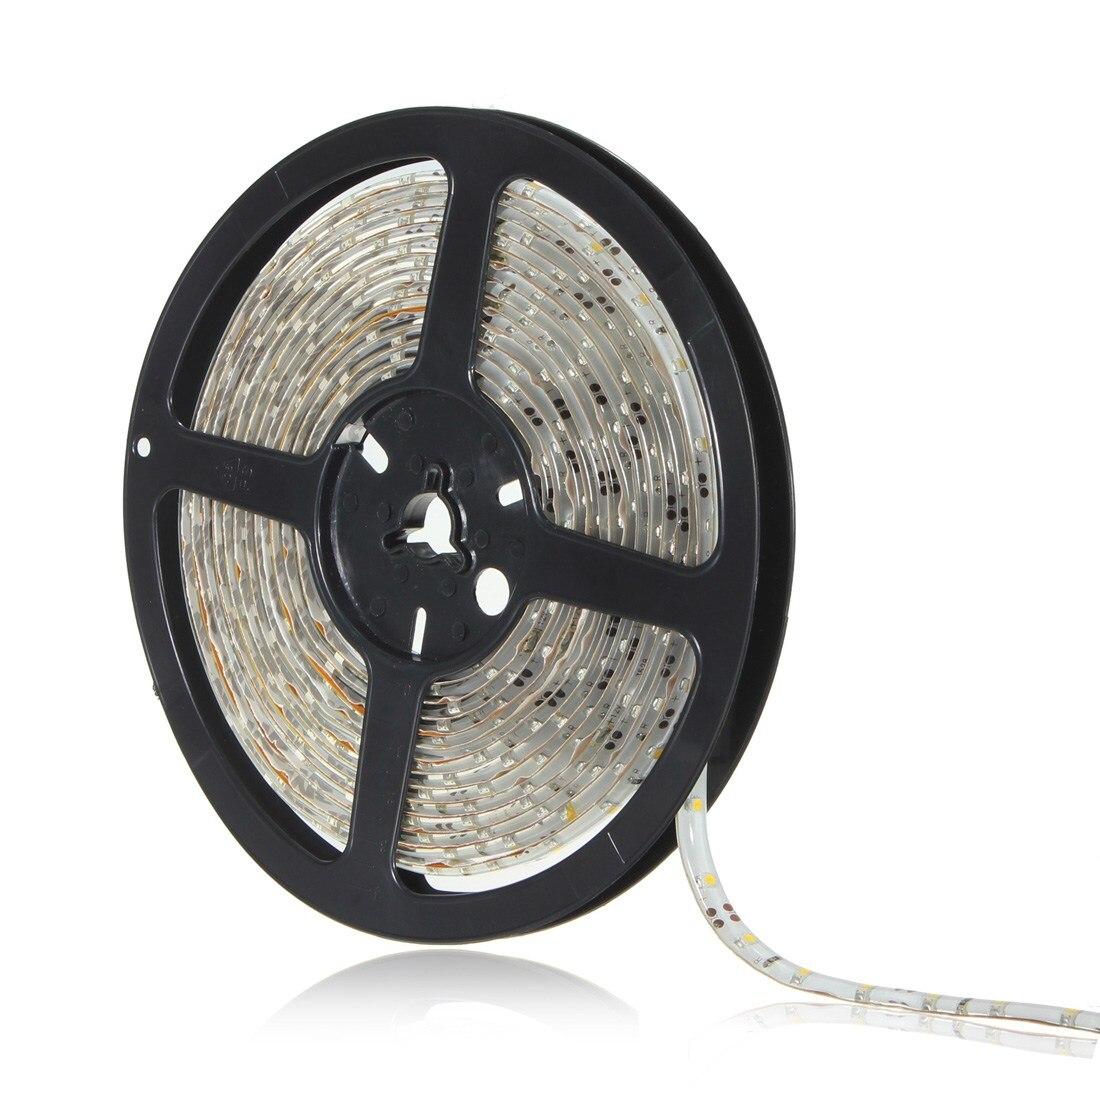 Smuxi 5M DC12V Waterproof LED Strip 3528 SMD 60Led/m Flexible Led Light Strip Lamp Warm white Tape Ribbon